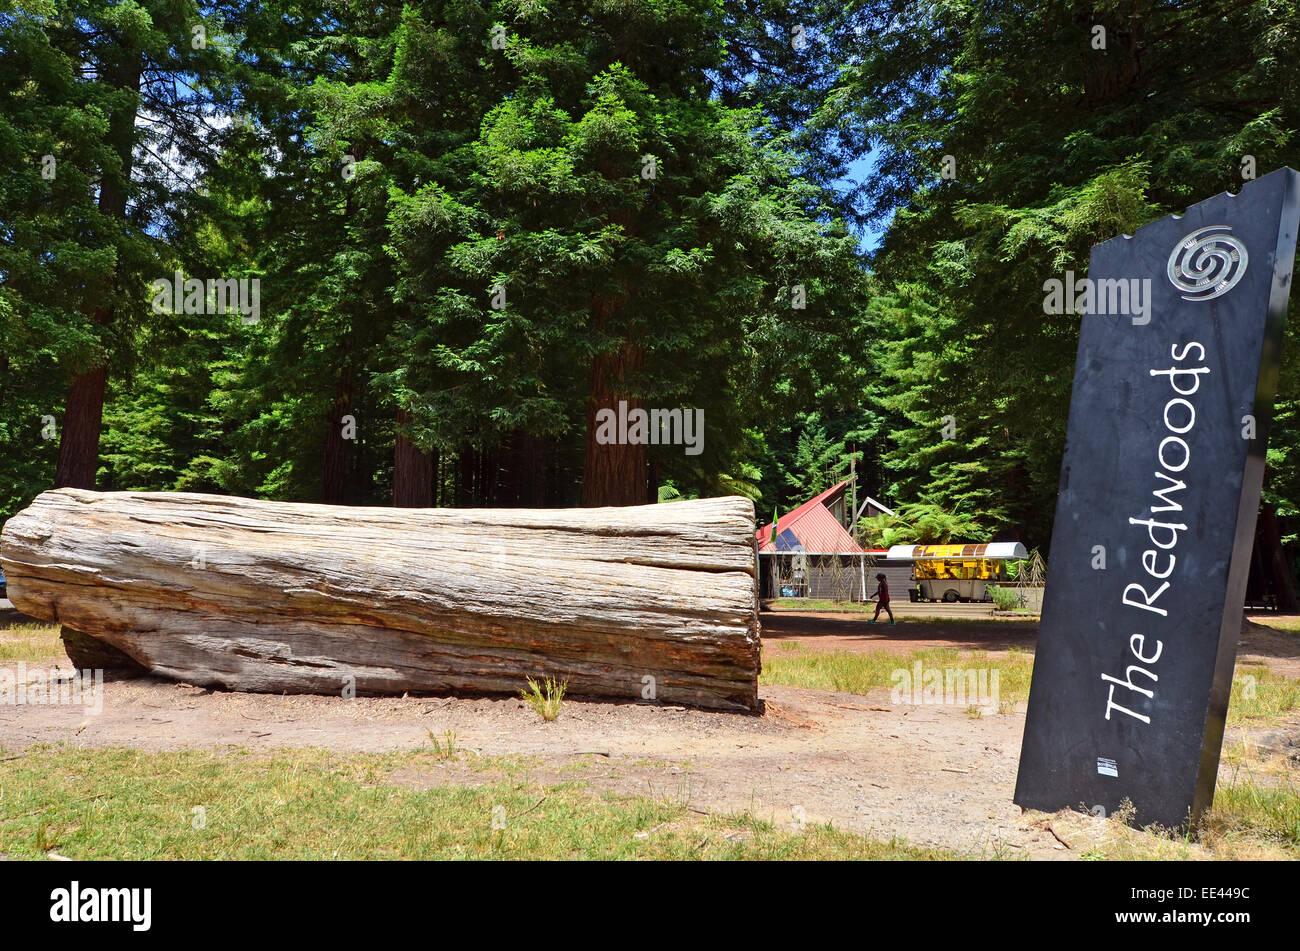 ROTORUA, NZL - JAN 12 2015:The entrance to Redwoods – Whakarewarewa Forest in Rotorua, New Zealand.It's an exsotic - Stock Image